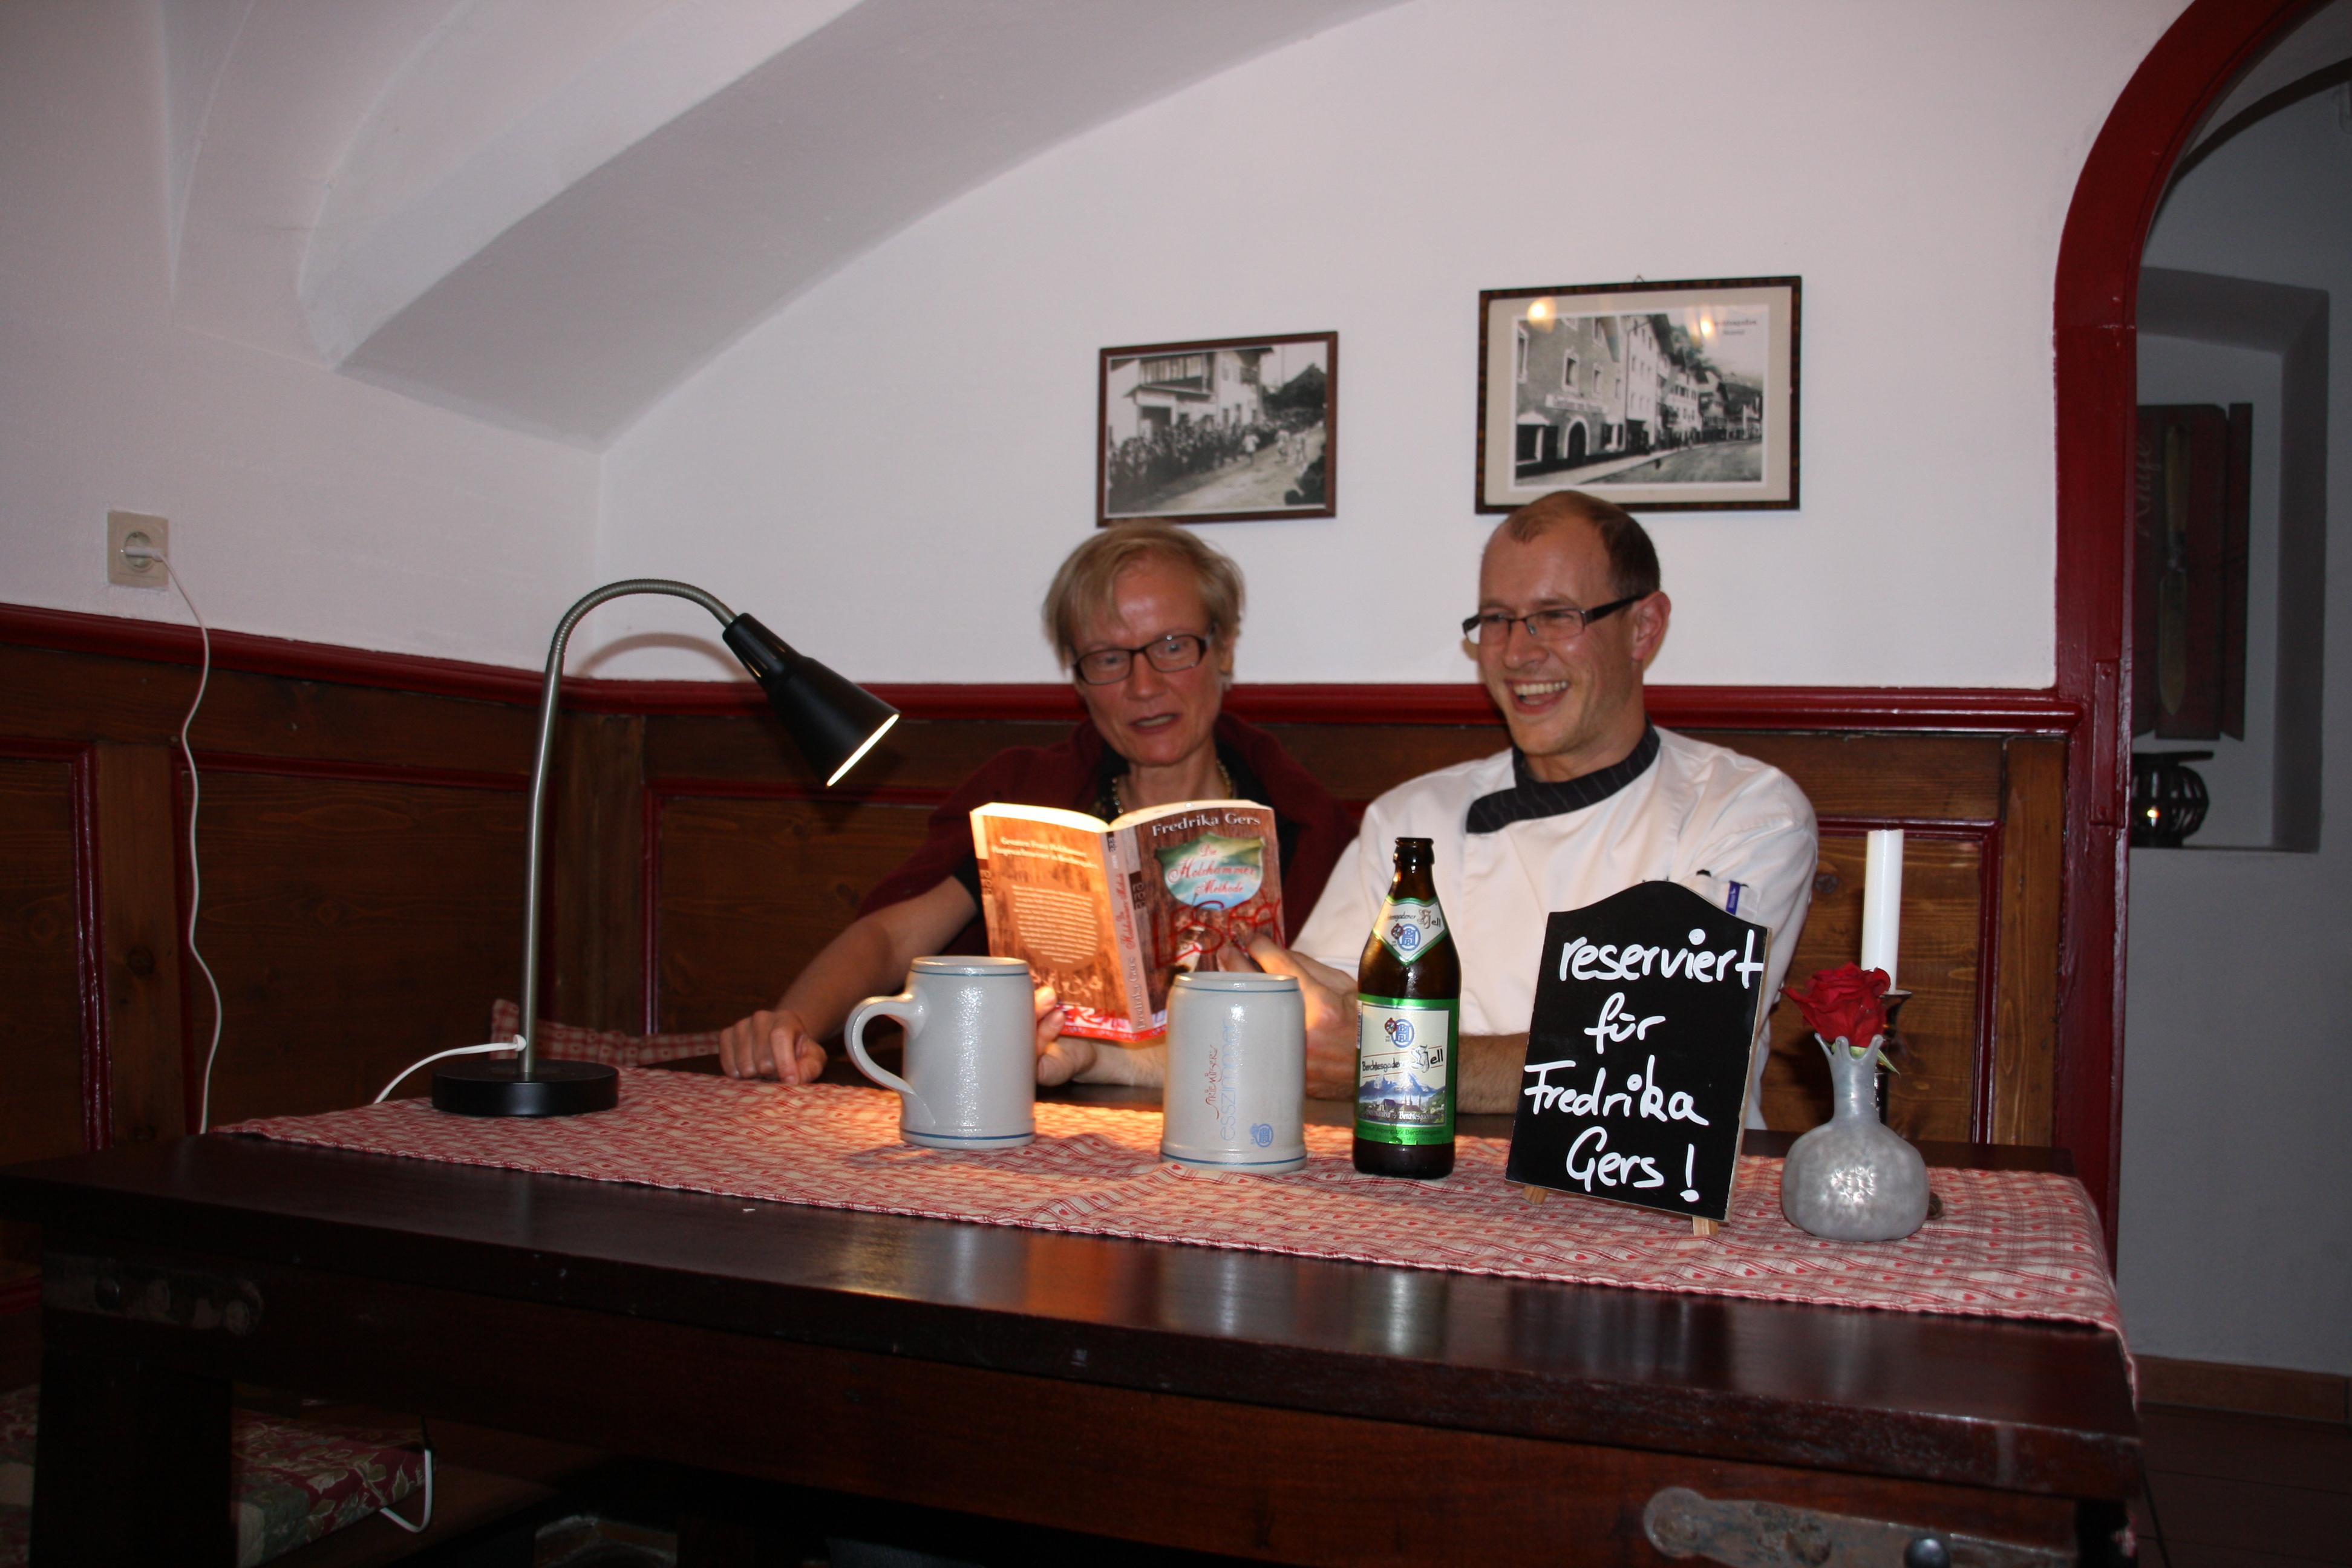 mord mit methode - berchtesgadener land blog, Esszimmer dekoo